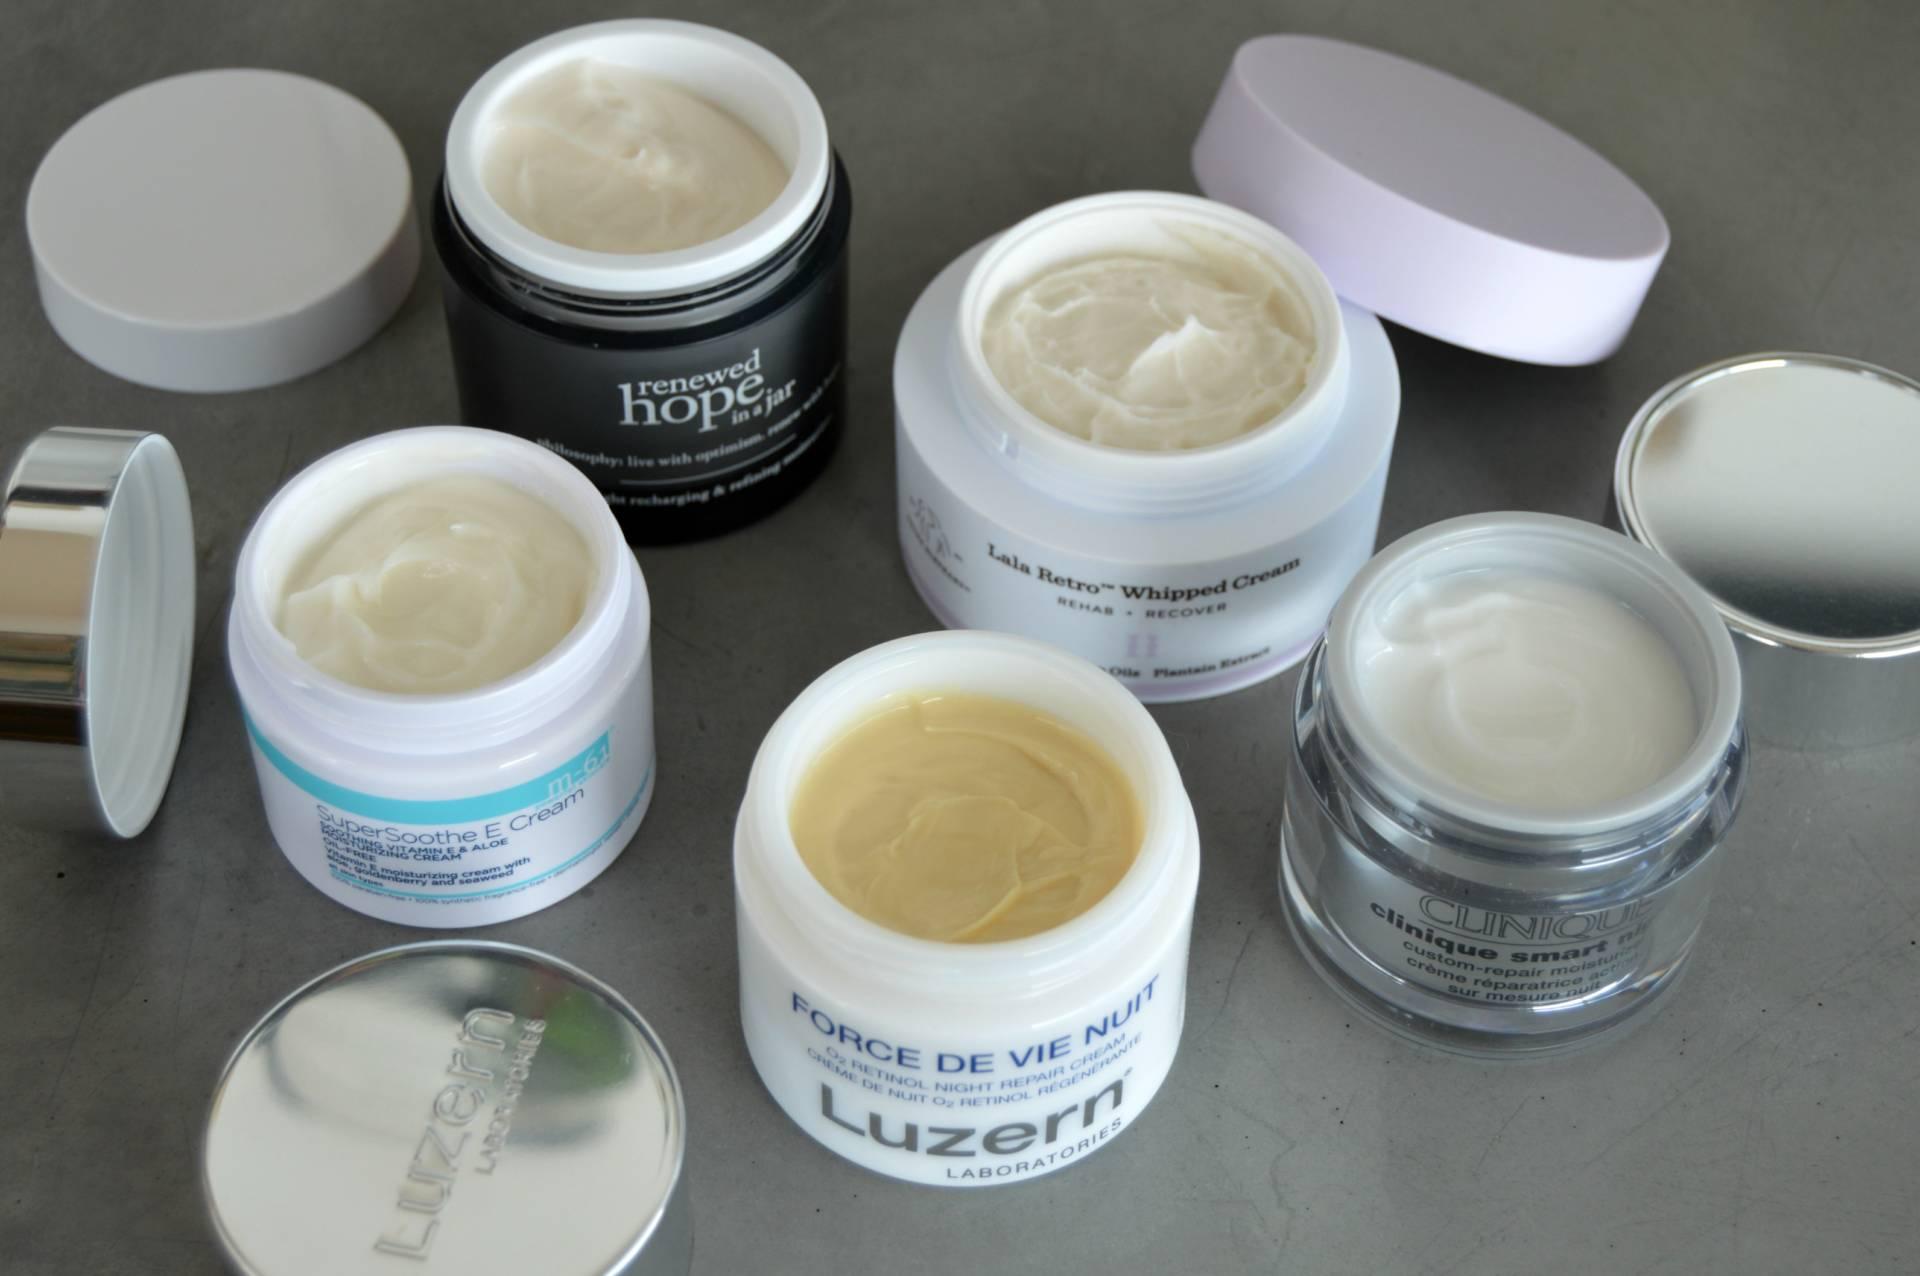 best-of-night-day-creams-inhautepursuit-review-favorite